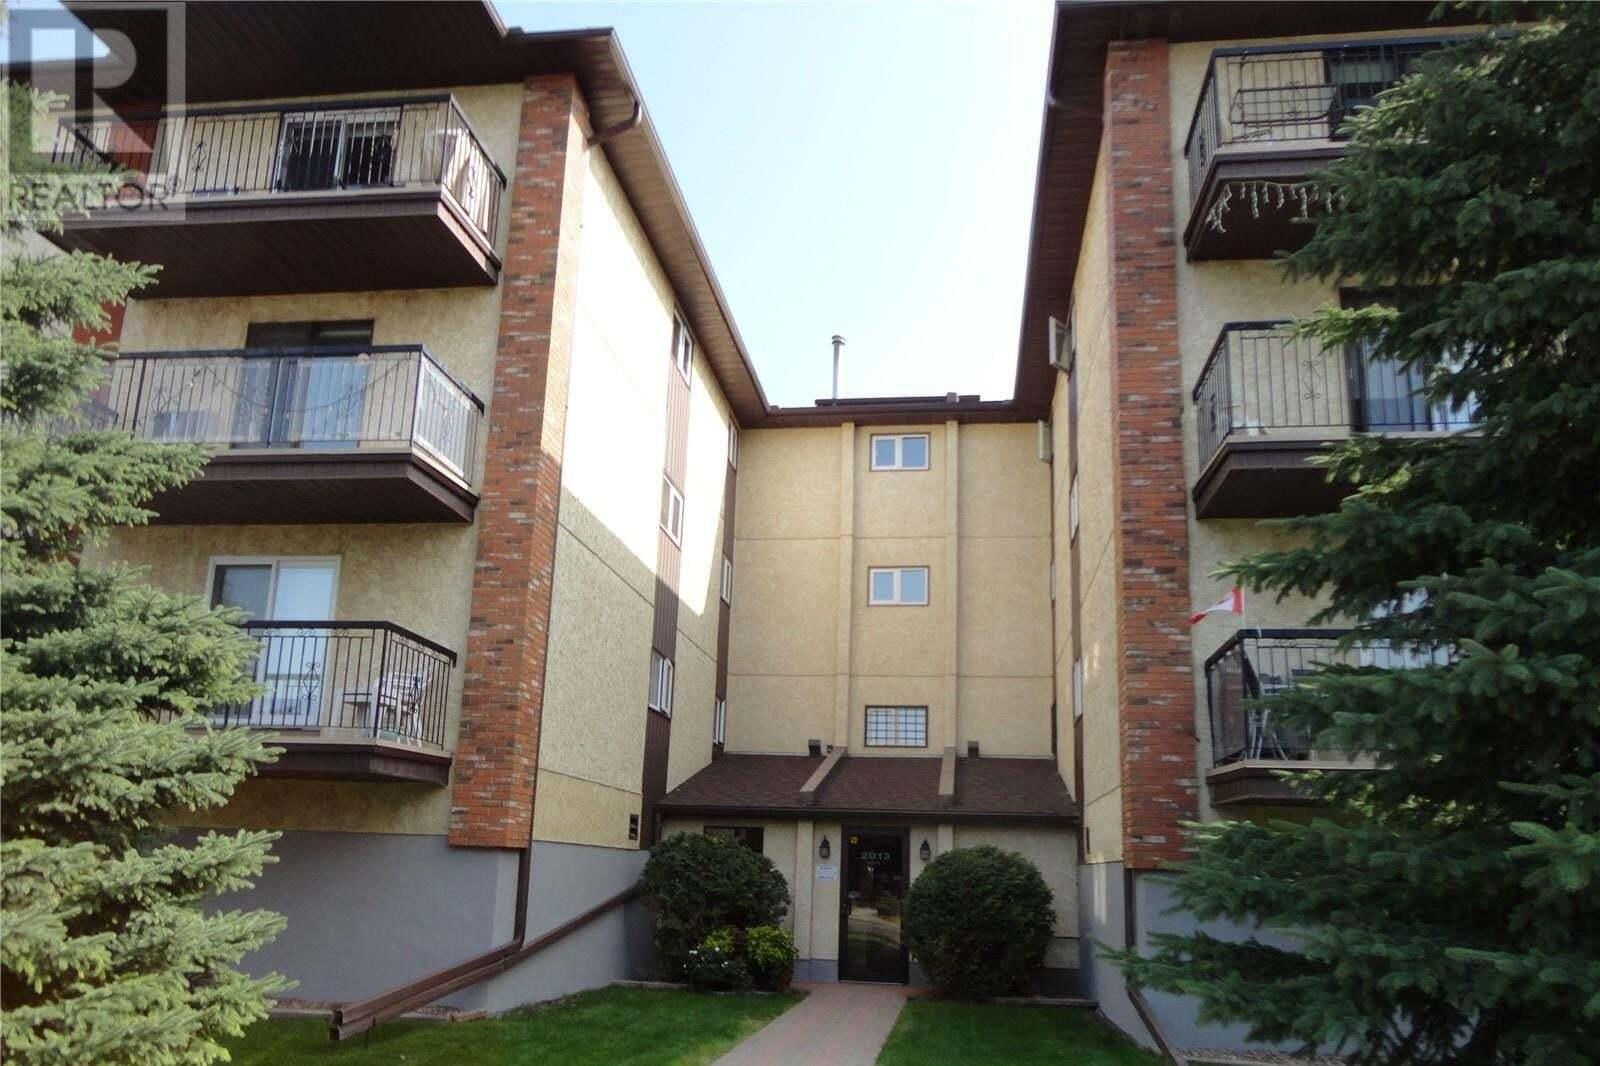 Townhouse for sale at 2013 Arlington Ave Unit 302 Saskatoon Saskatchewan - MLS: SK827400